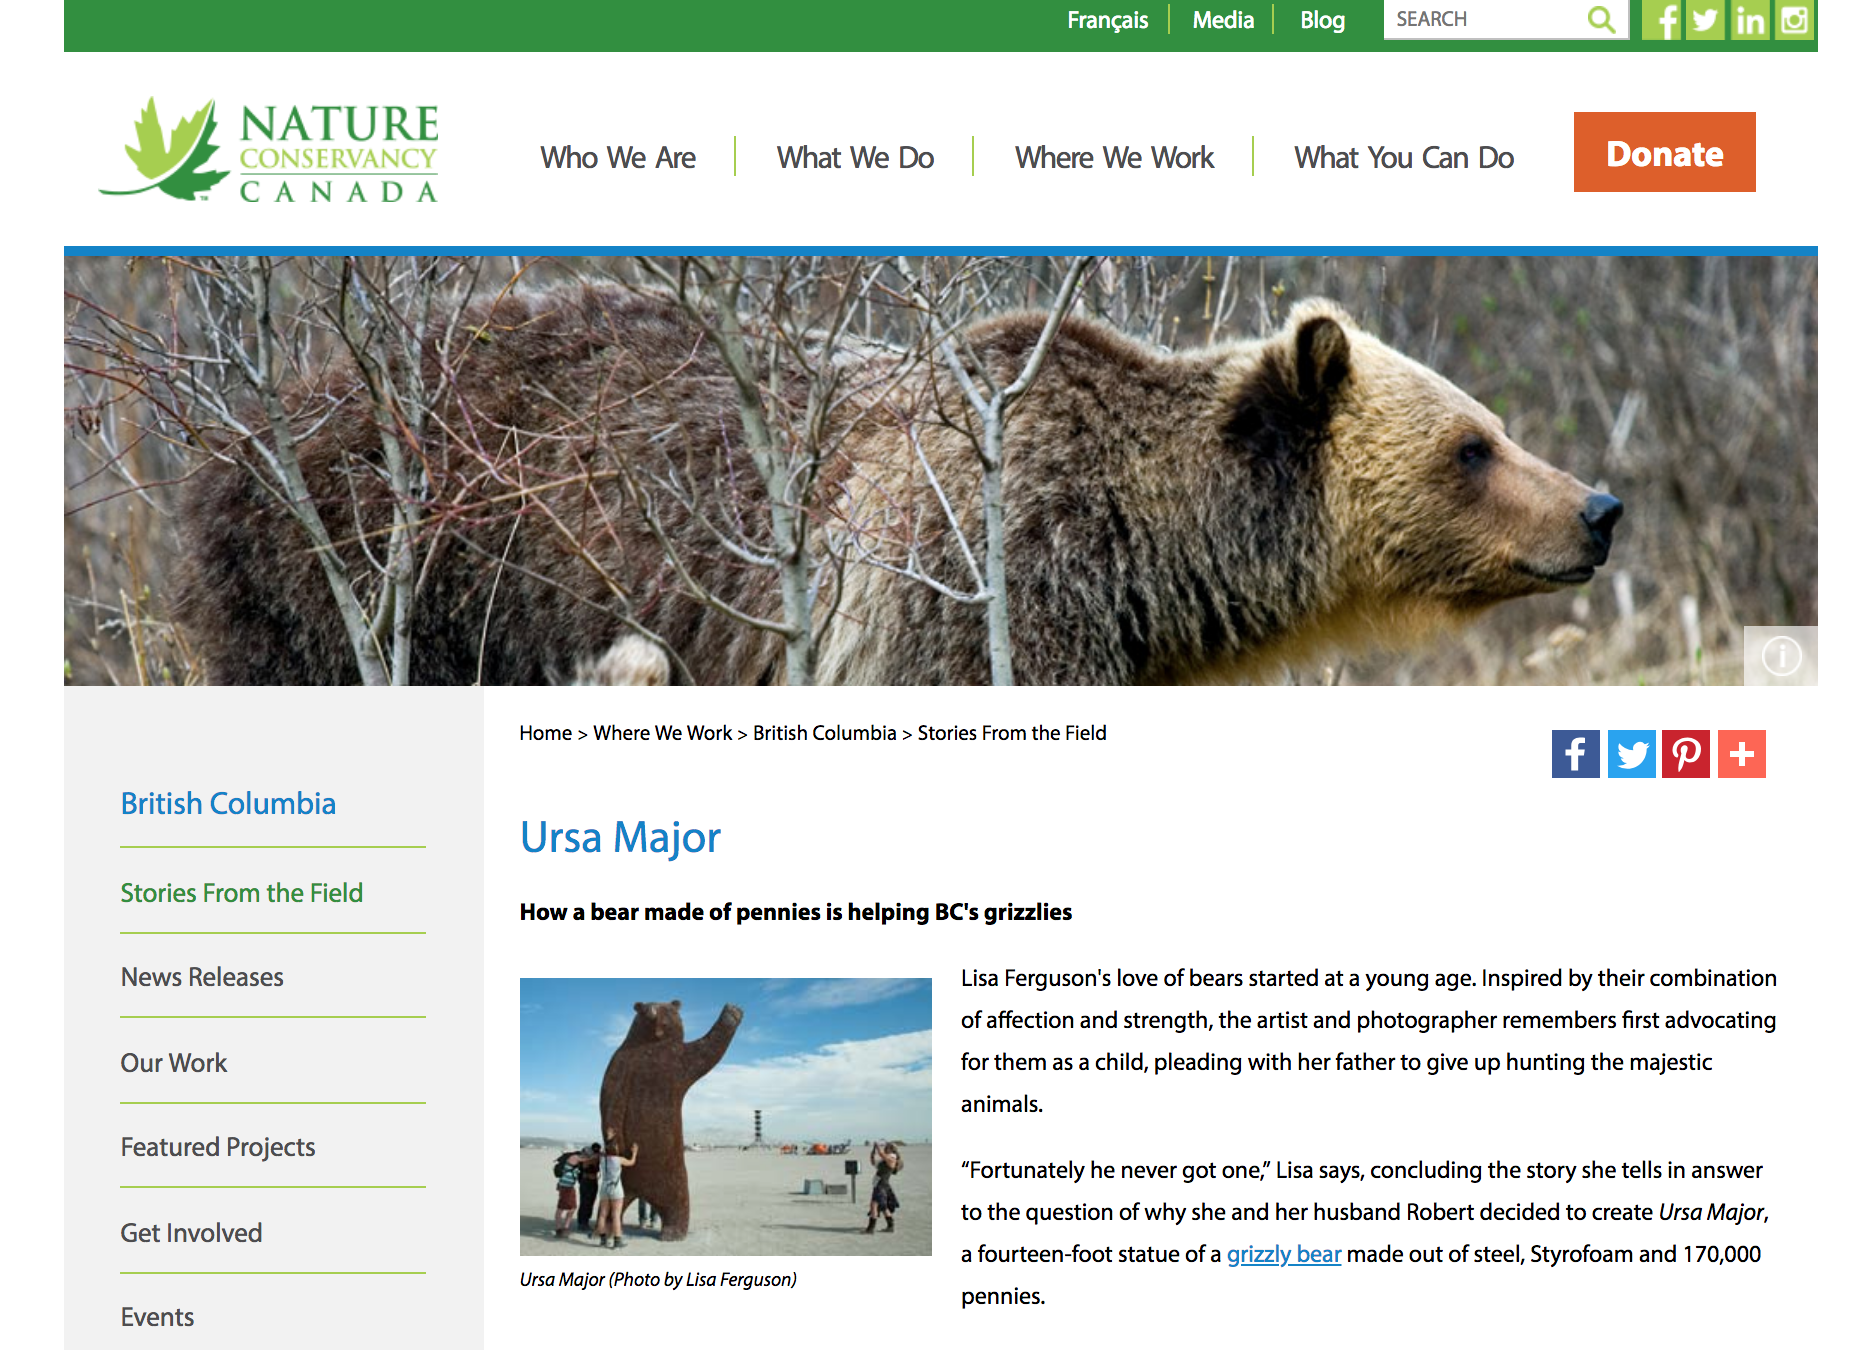 http://www.natureconservancy.ca/en/where-we-work/british-columbia/stories/ursa-major.html